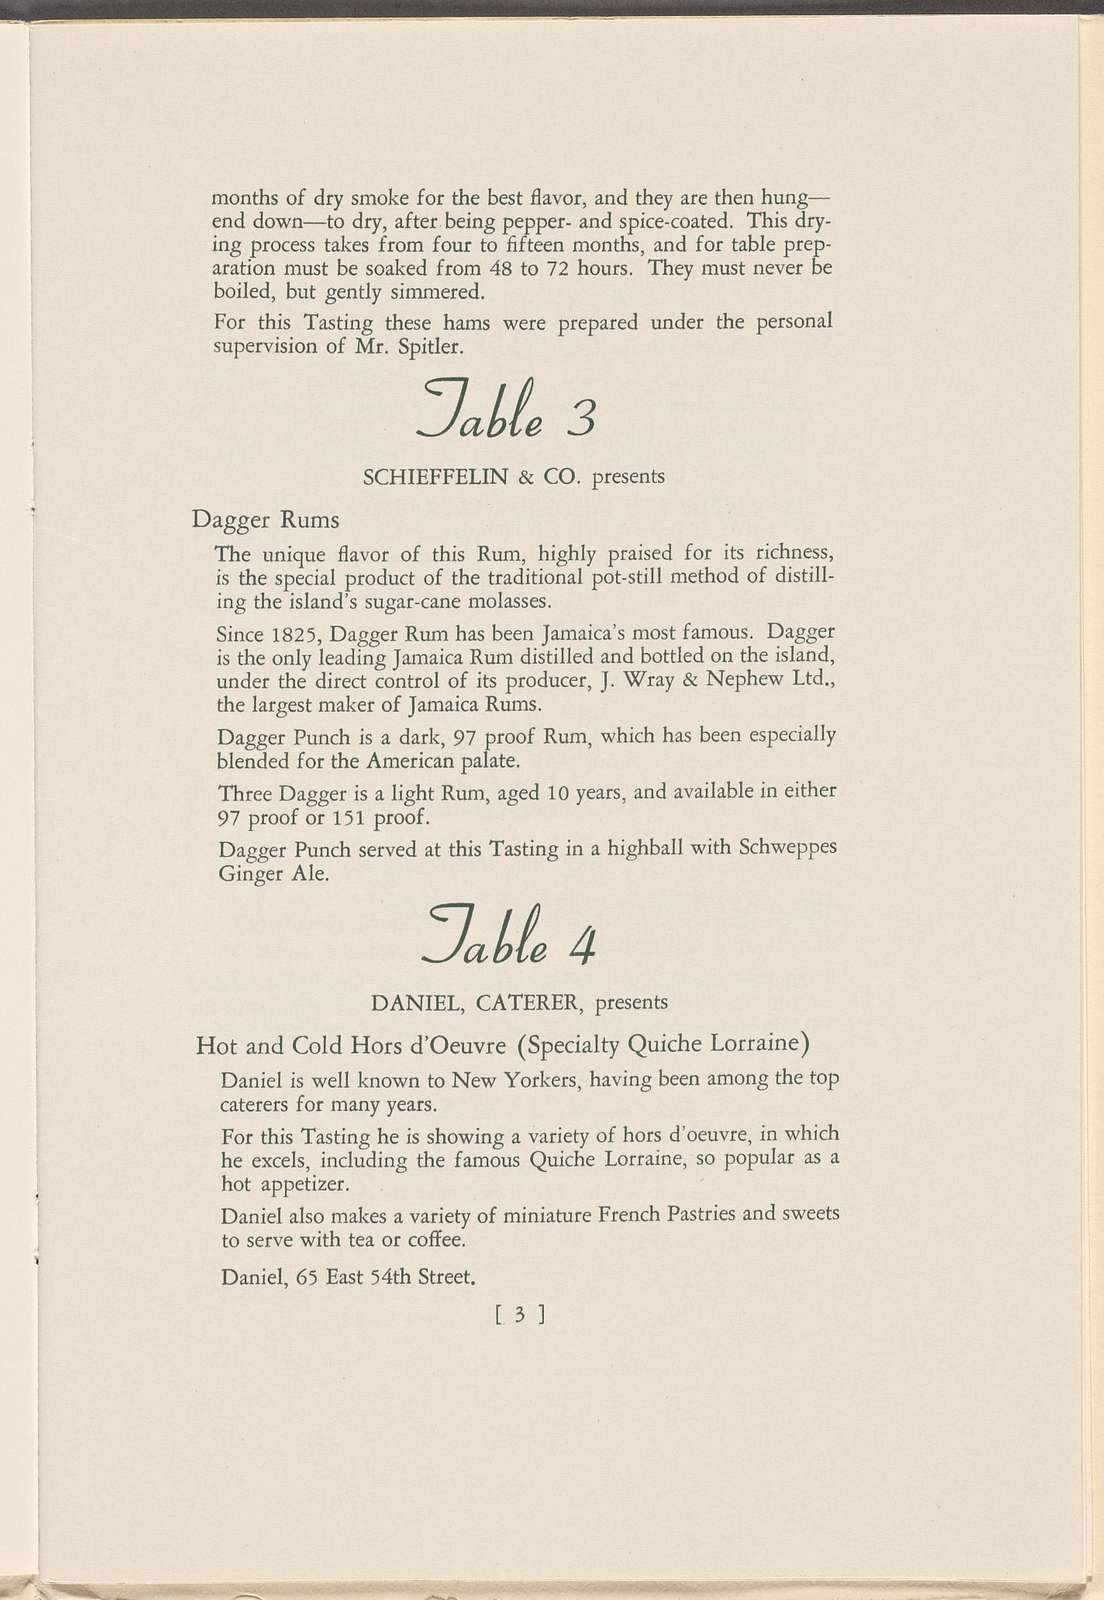 Hotel Sheraton-Astor; Belvedere Room